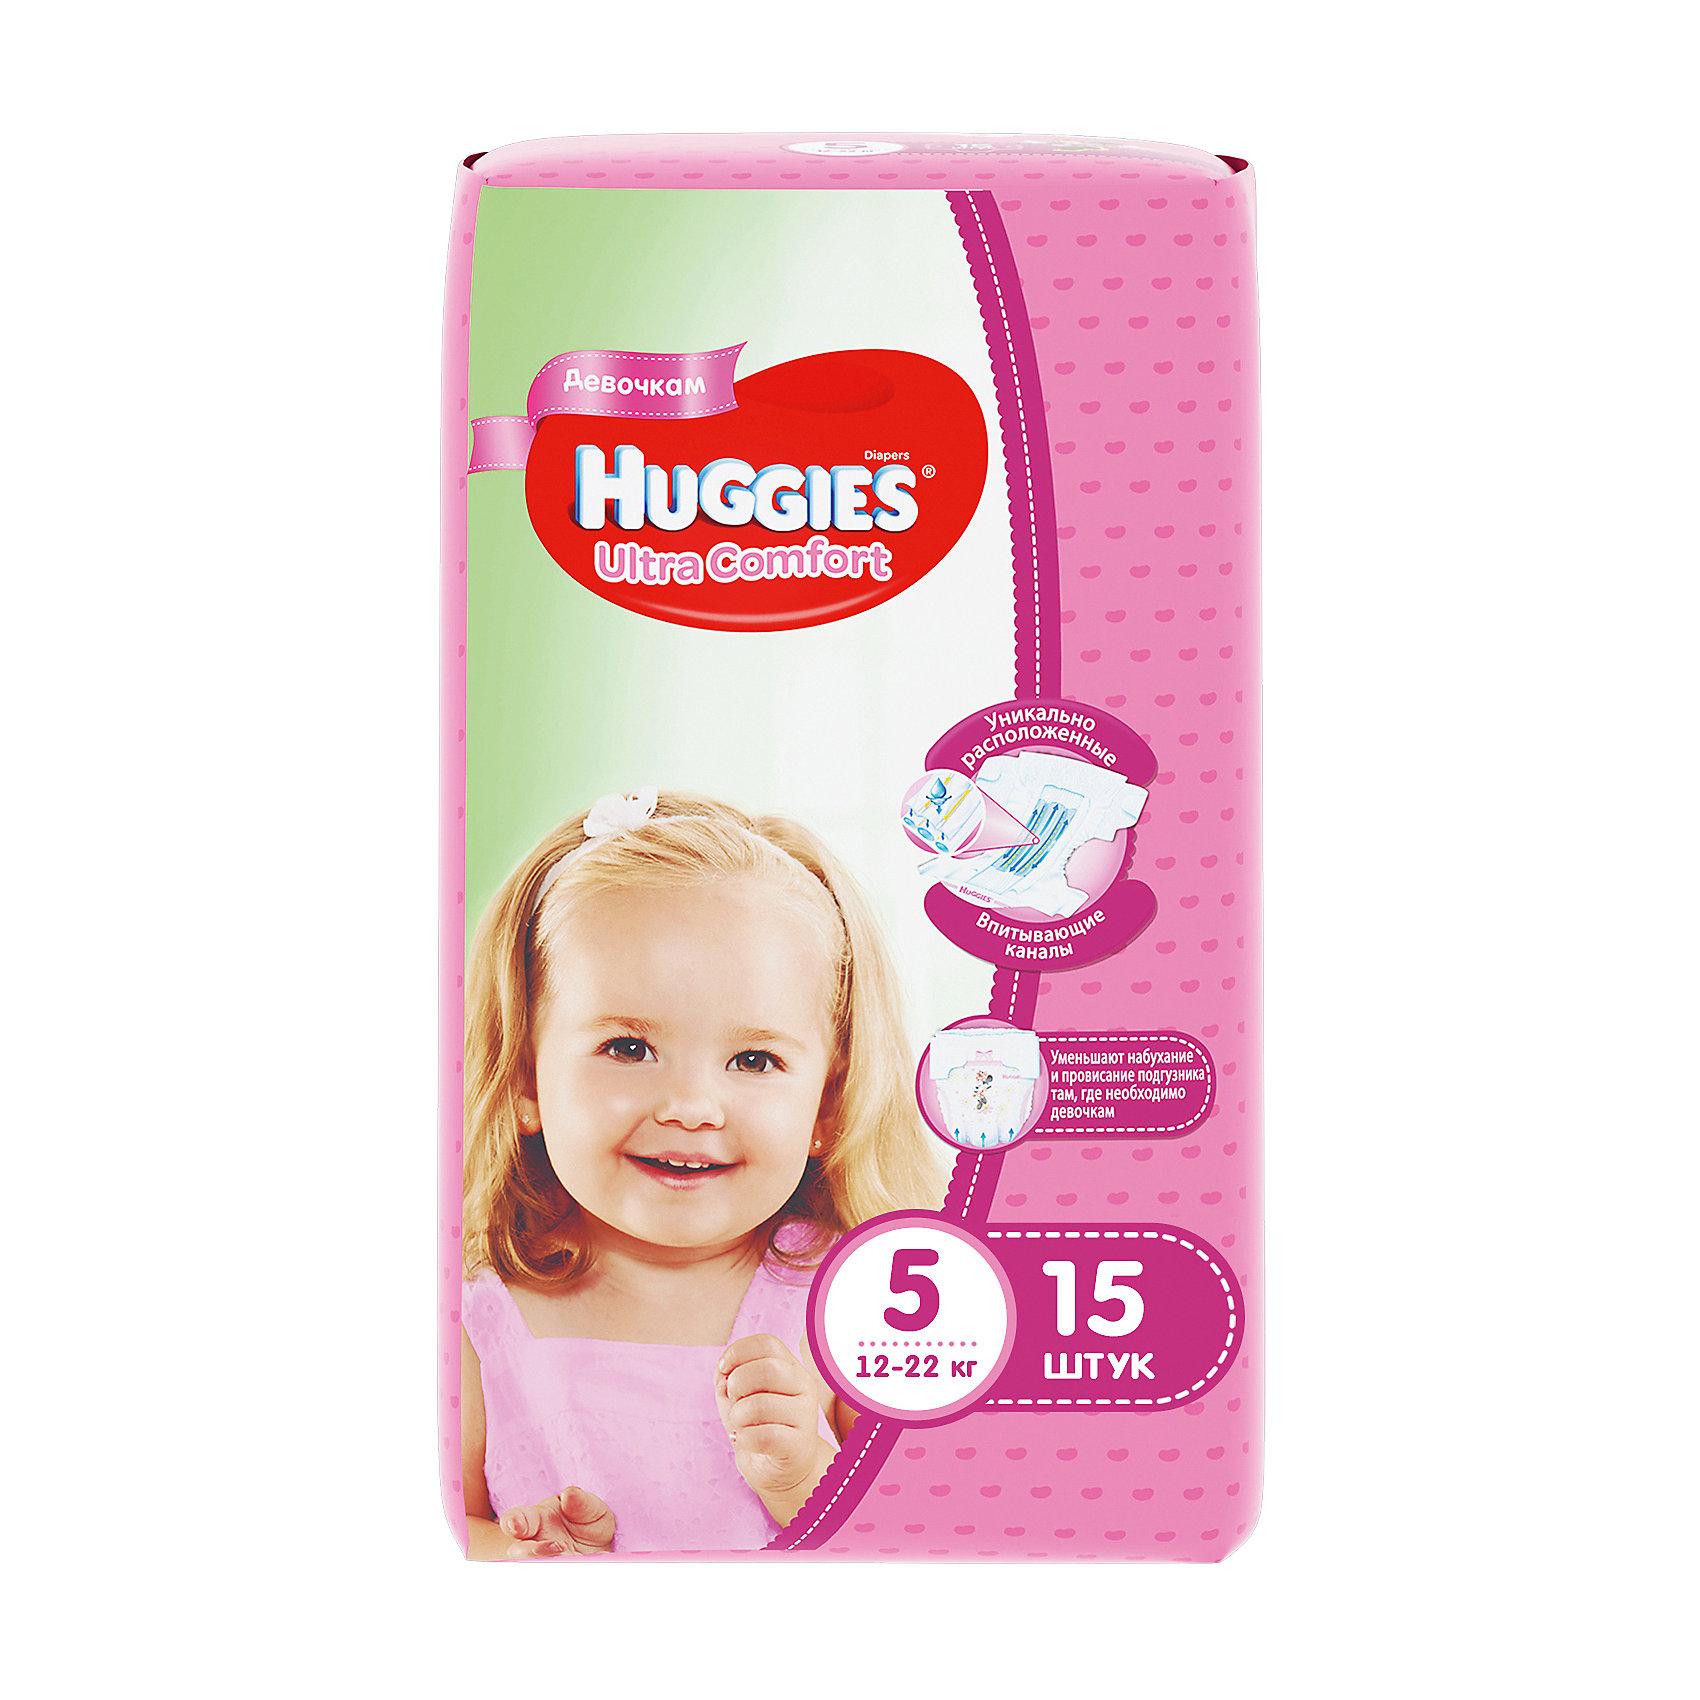 ���������� Huggies Ultra Comfort ��� ������� (5) 12-22 ��, 15 ��. (HUGGIES)